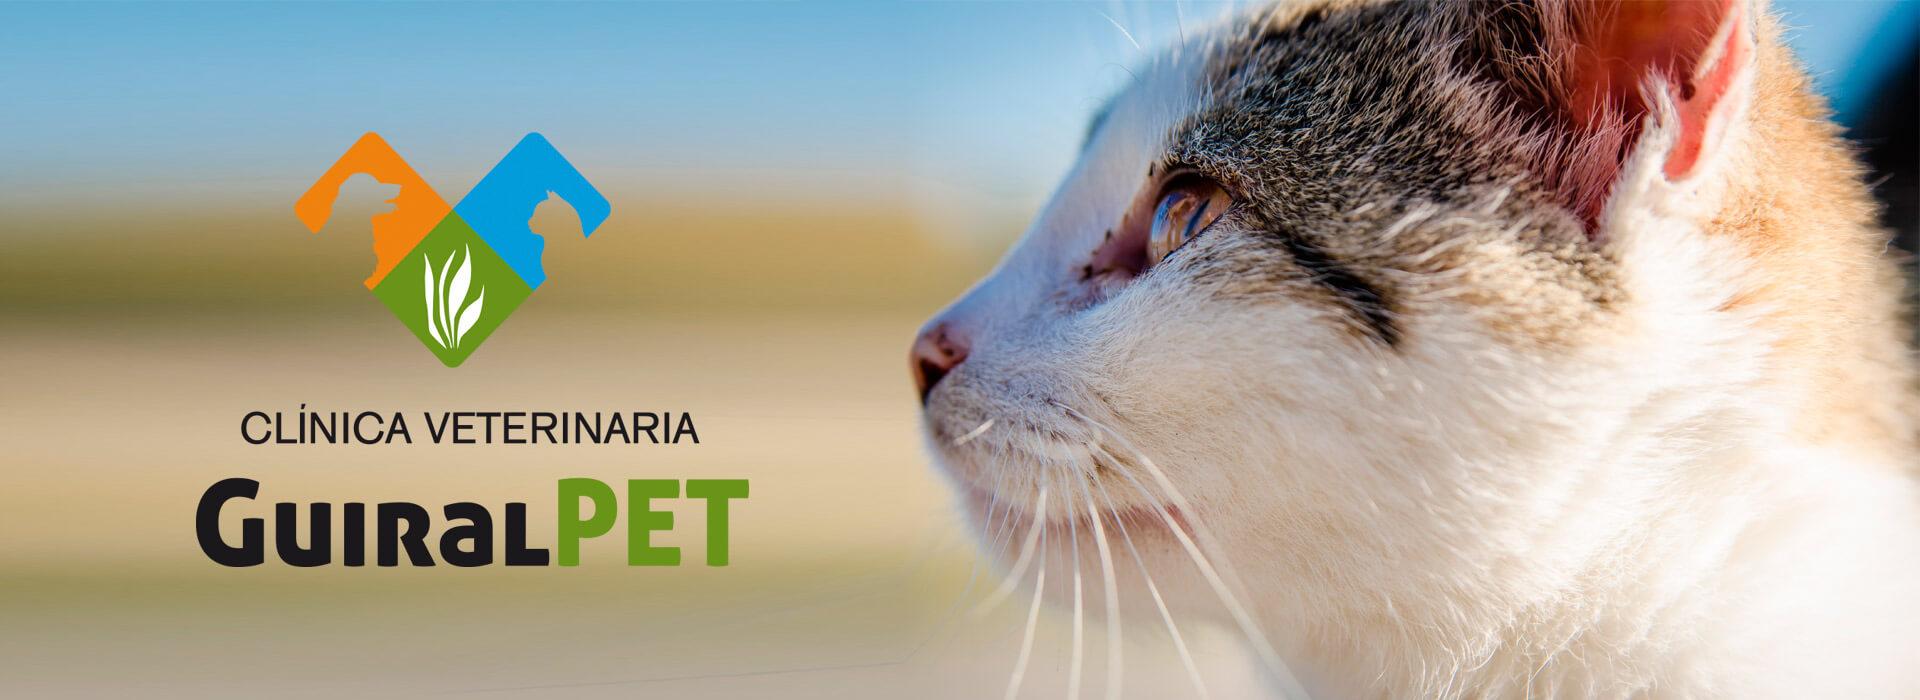 Clínica veterinaria en Huesca